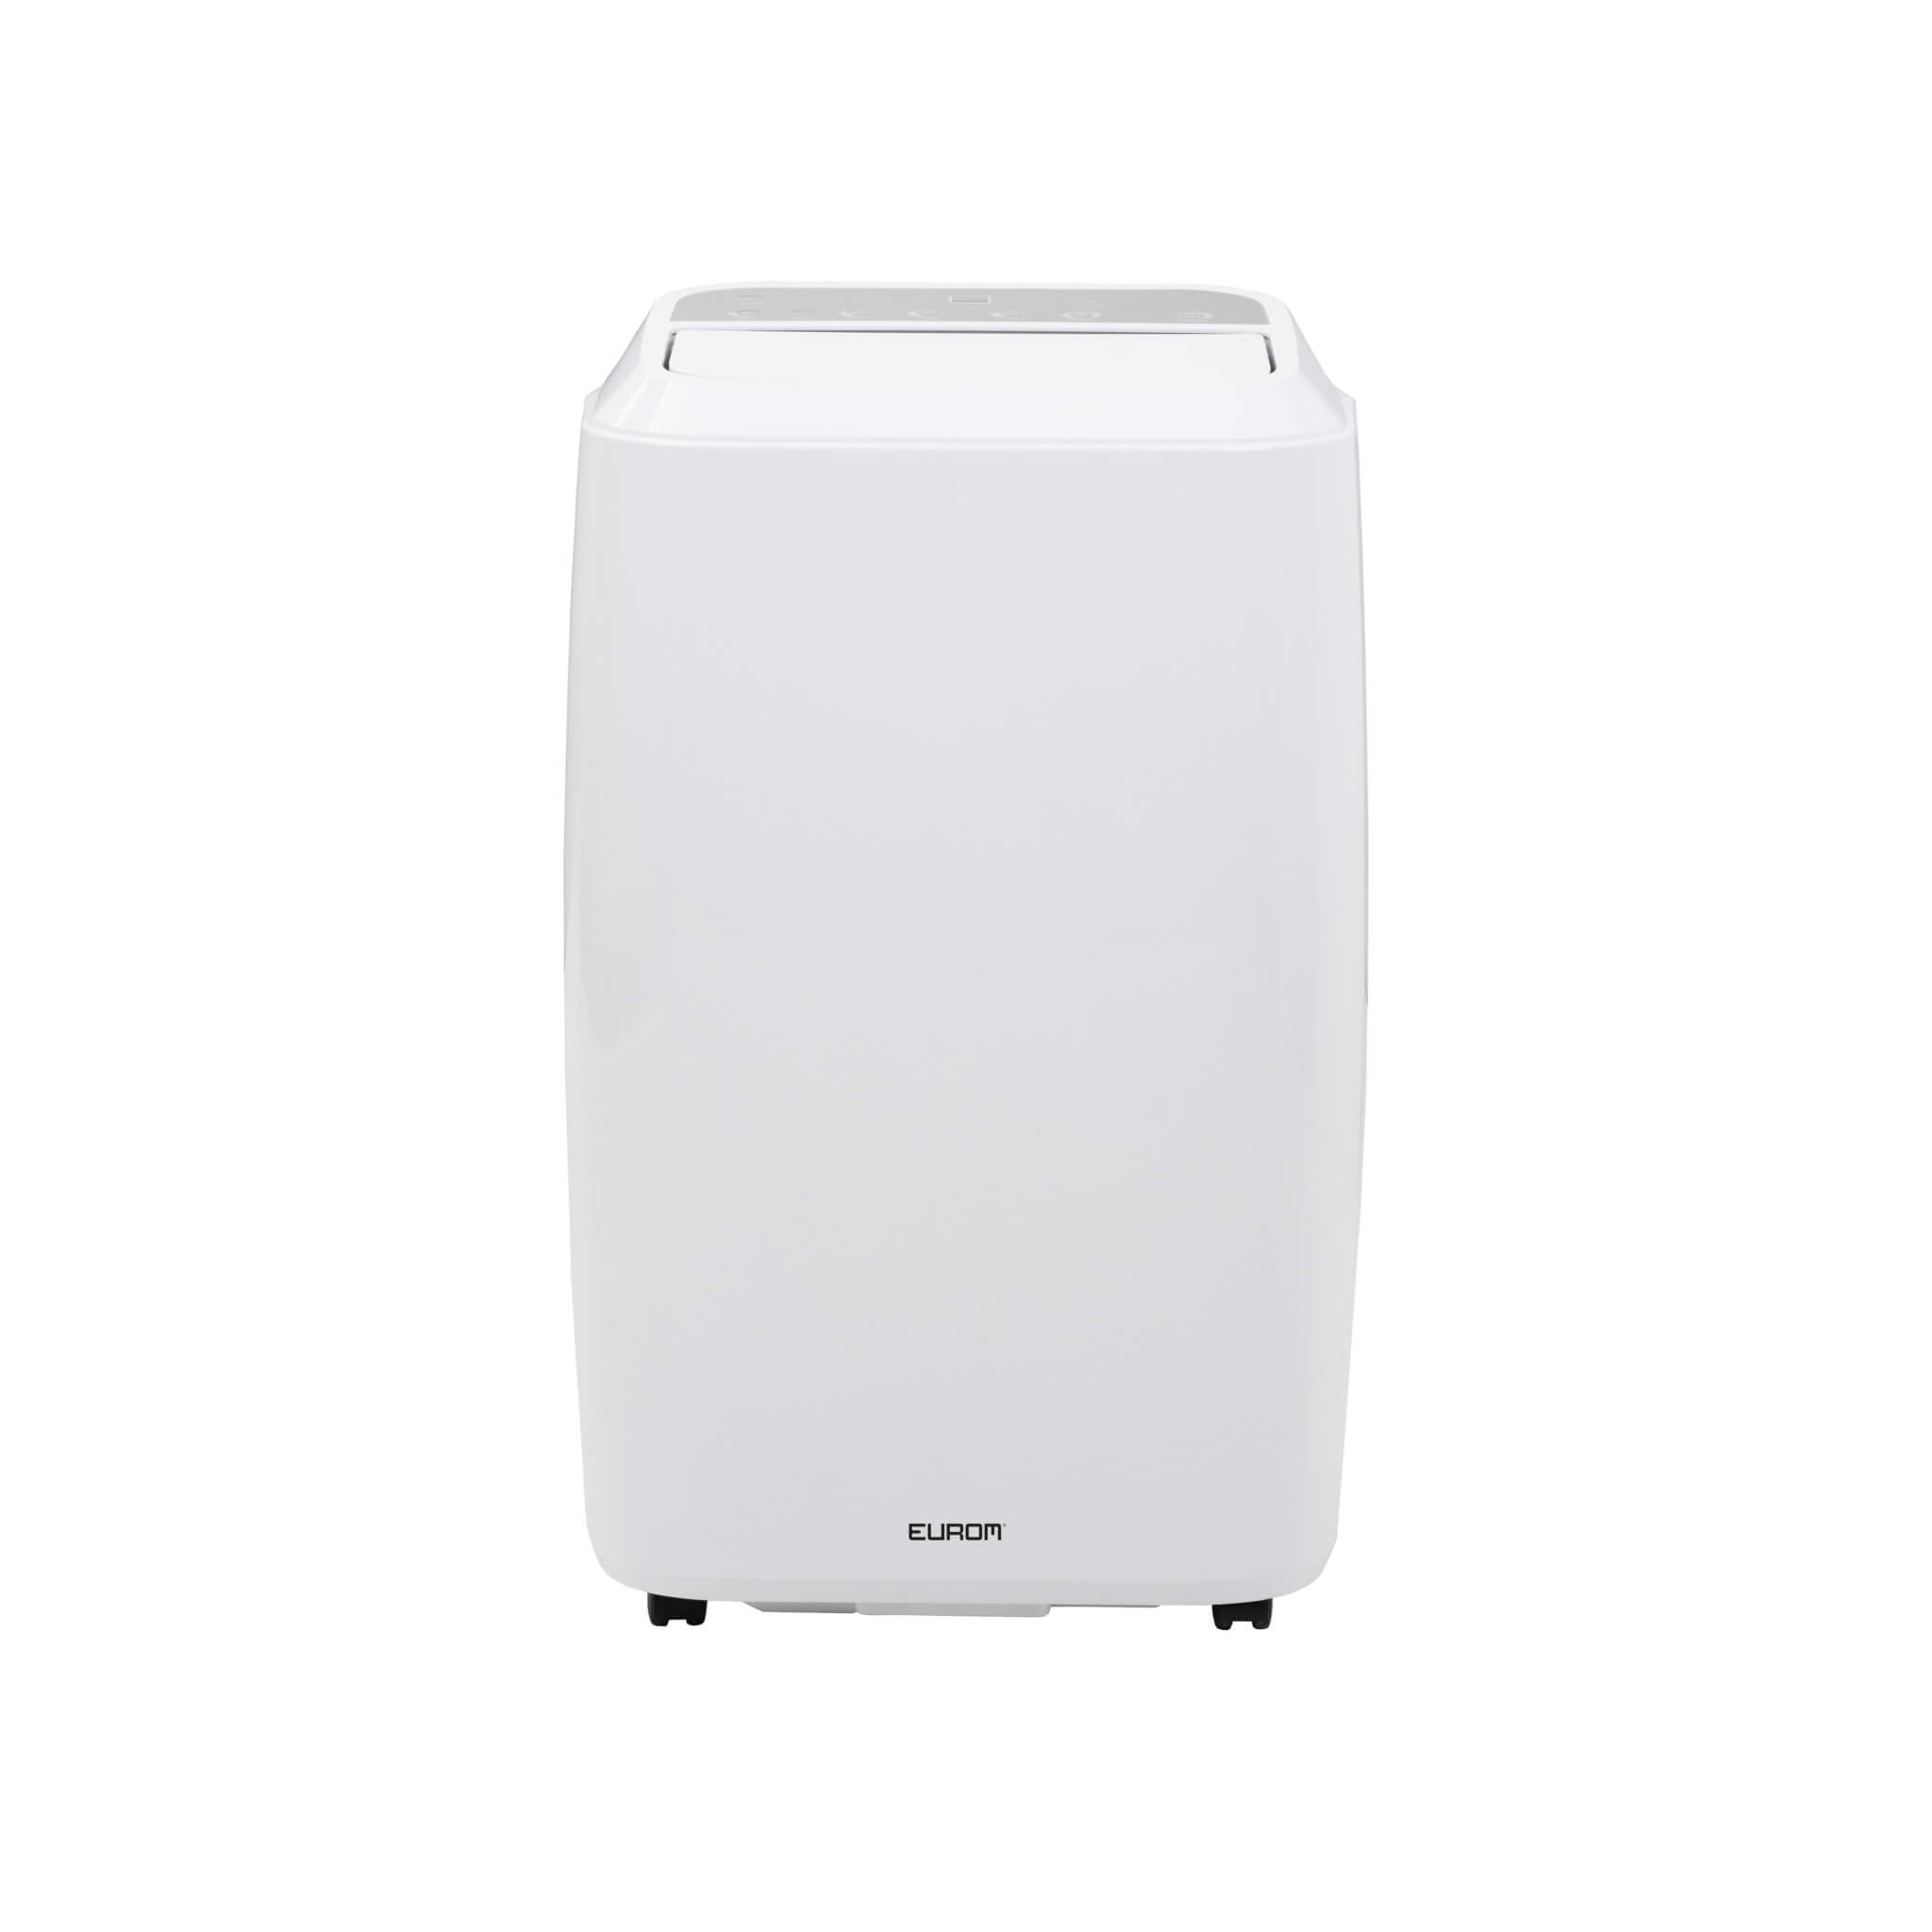 Cool-Eco 90 wifi A++